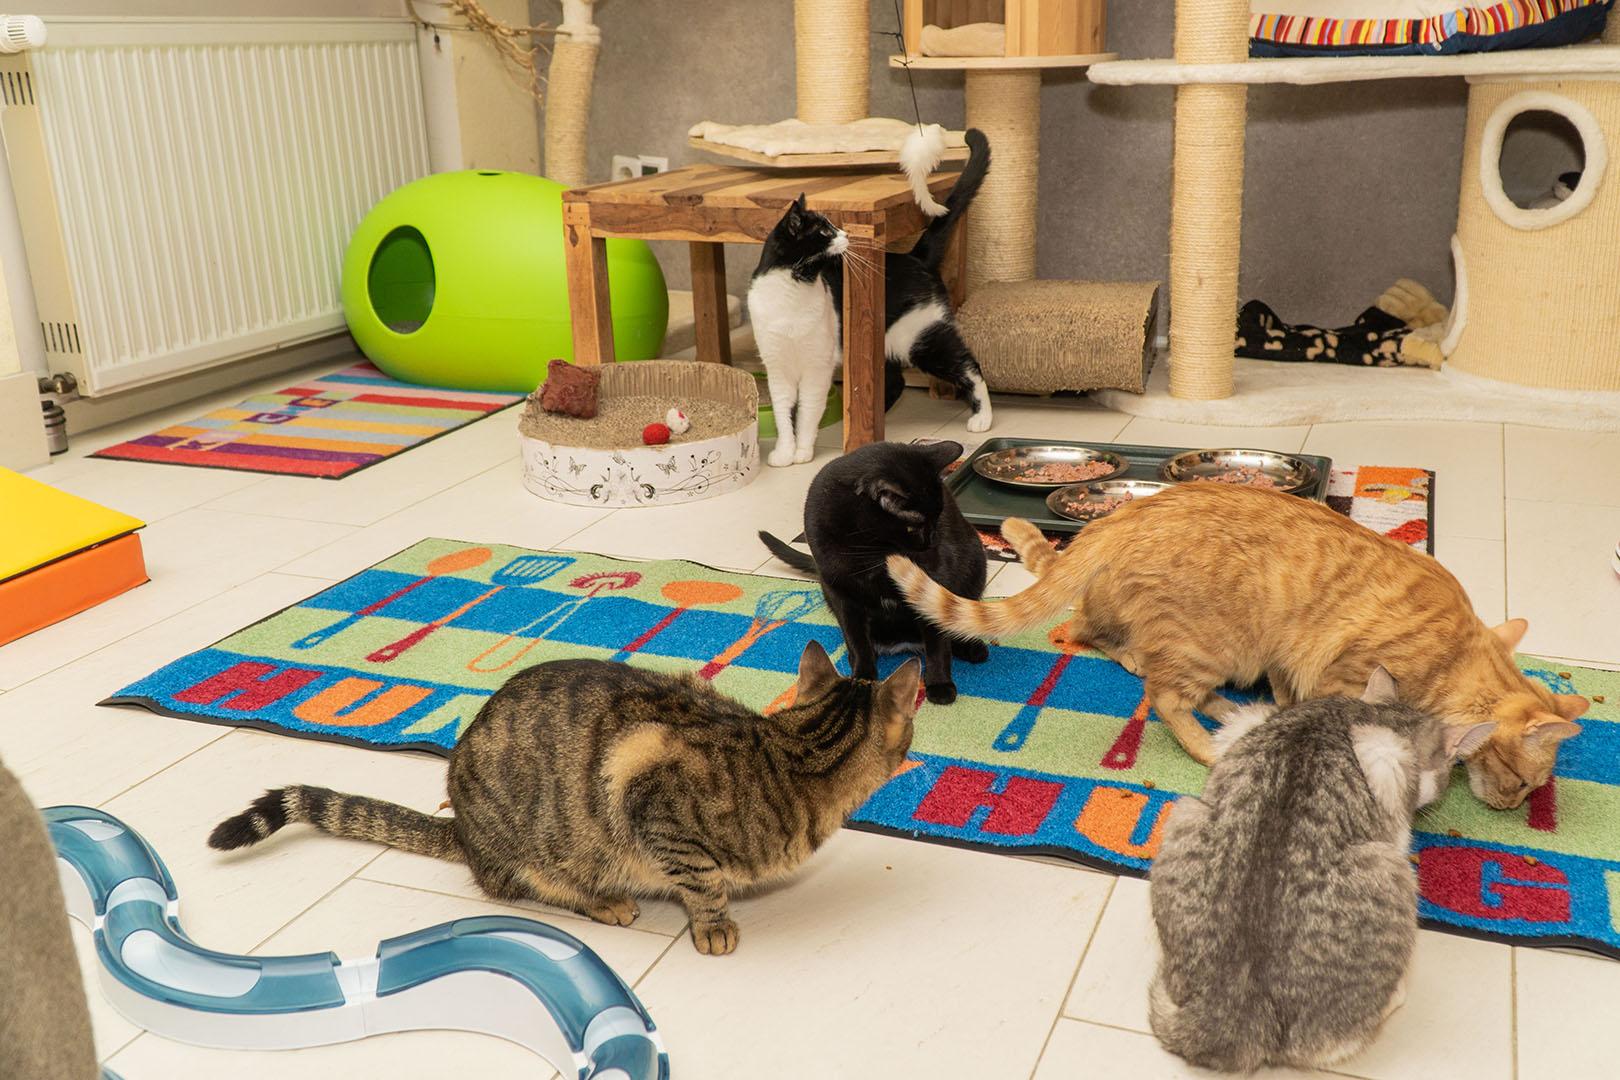 Pflegekatzen Startseite 30.10.18 (11)